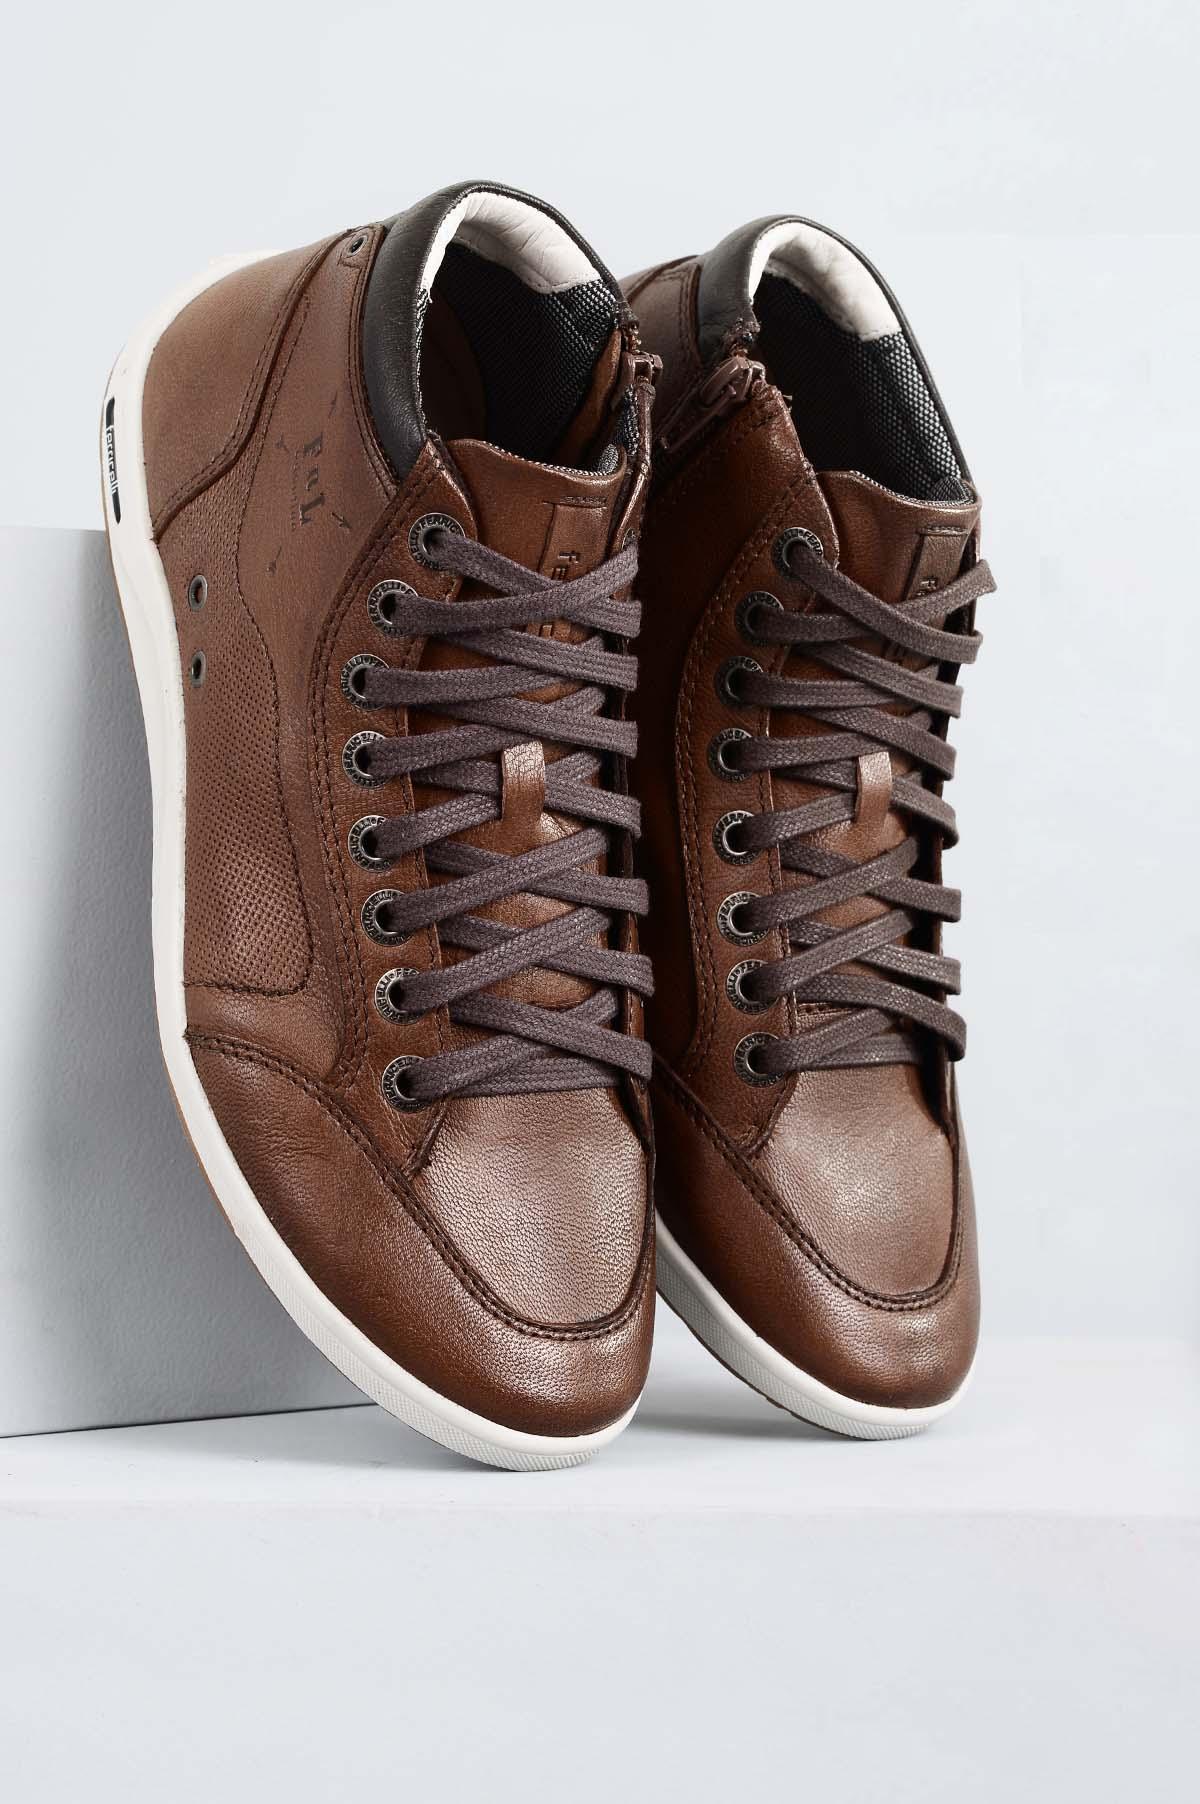 54549c0d6 Sapatênis Masculino Ferricelli Diogo CR-CAPPUCCINO - Mundial Calçados